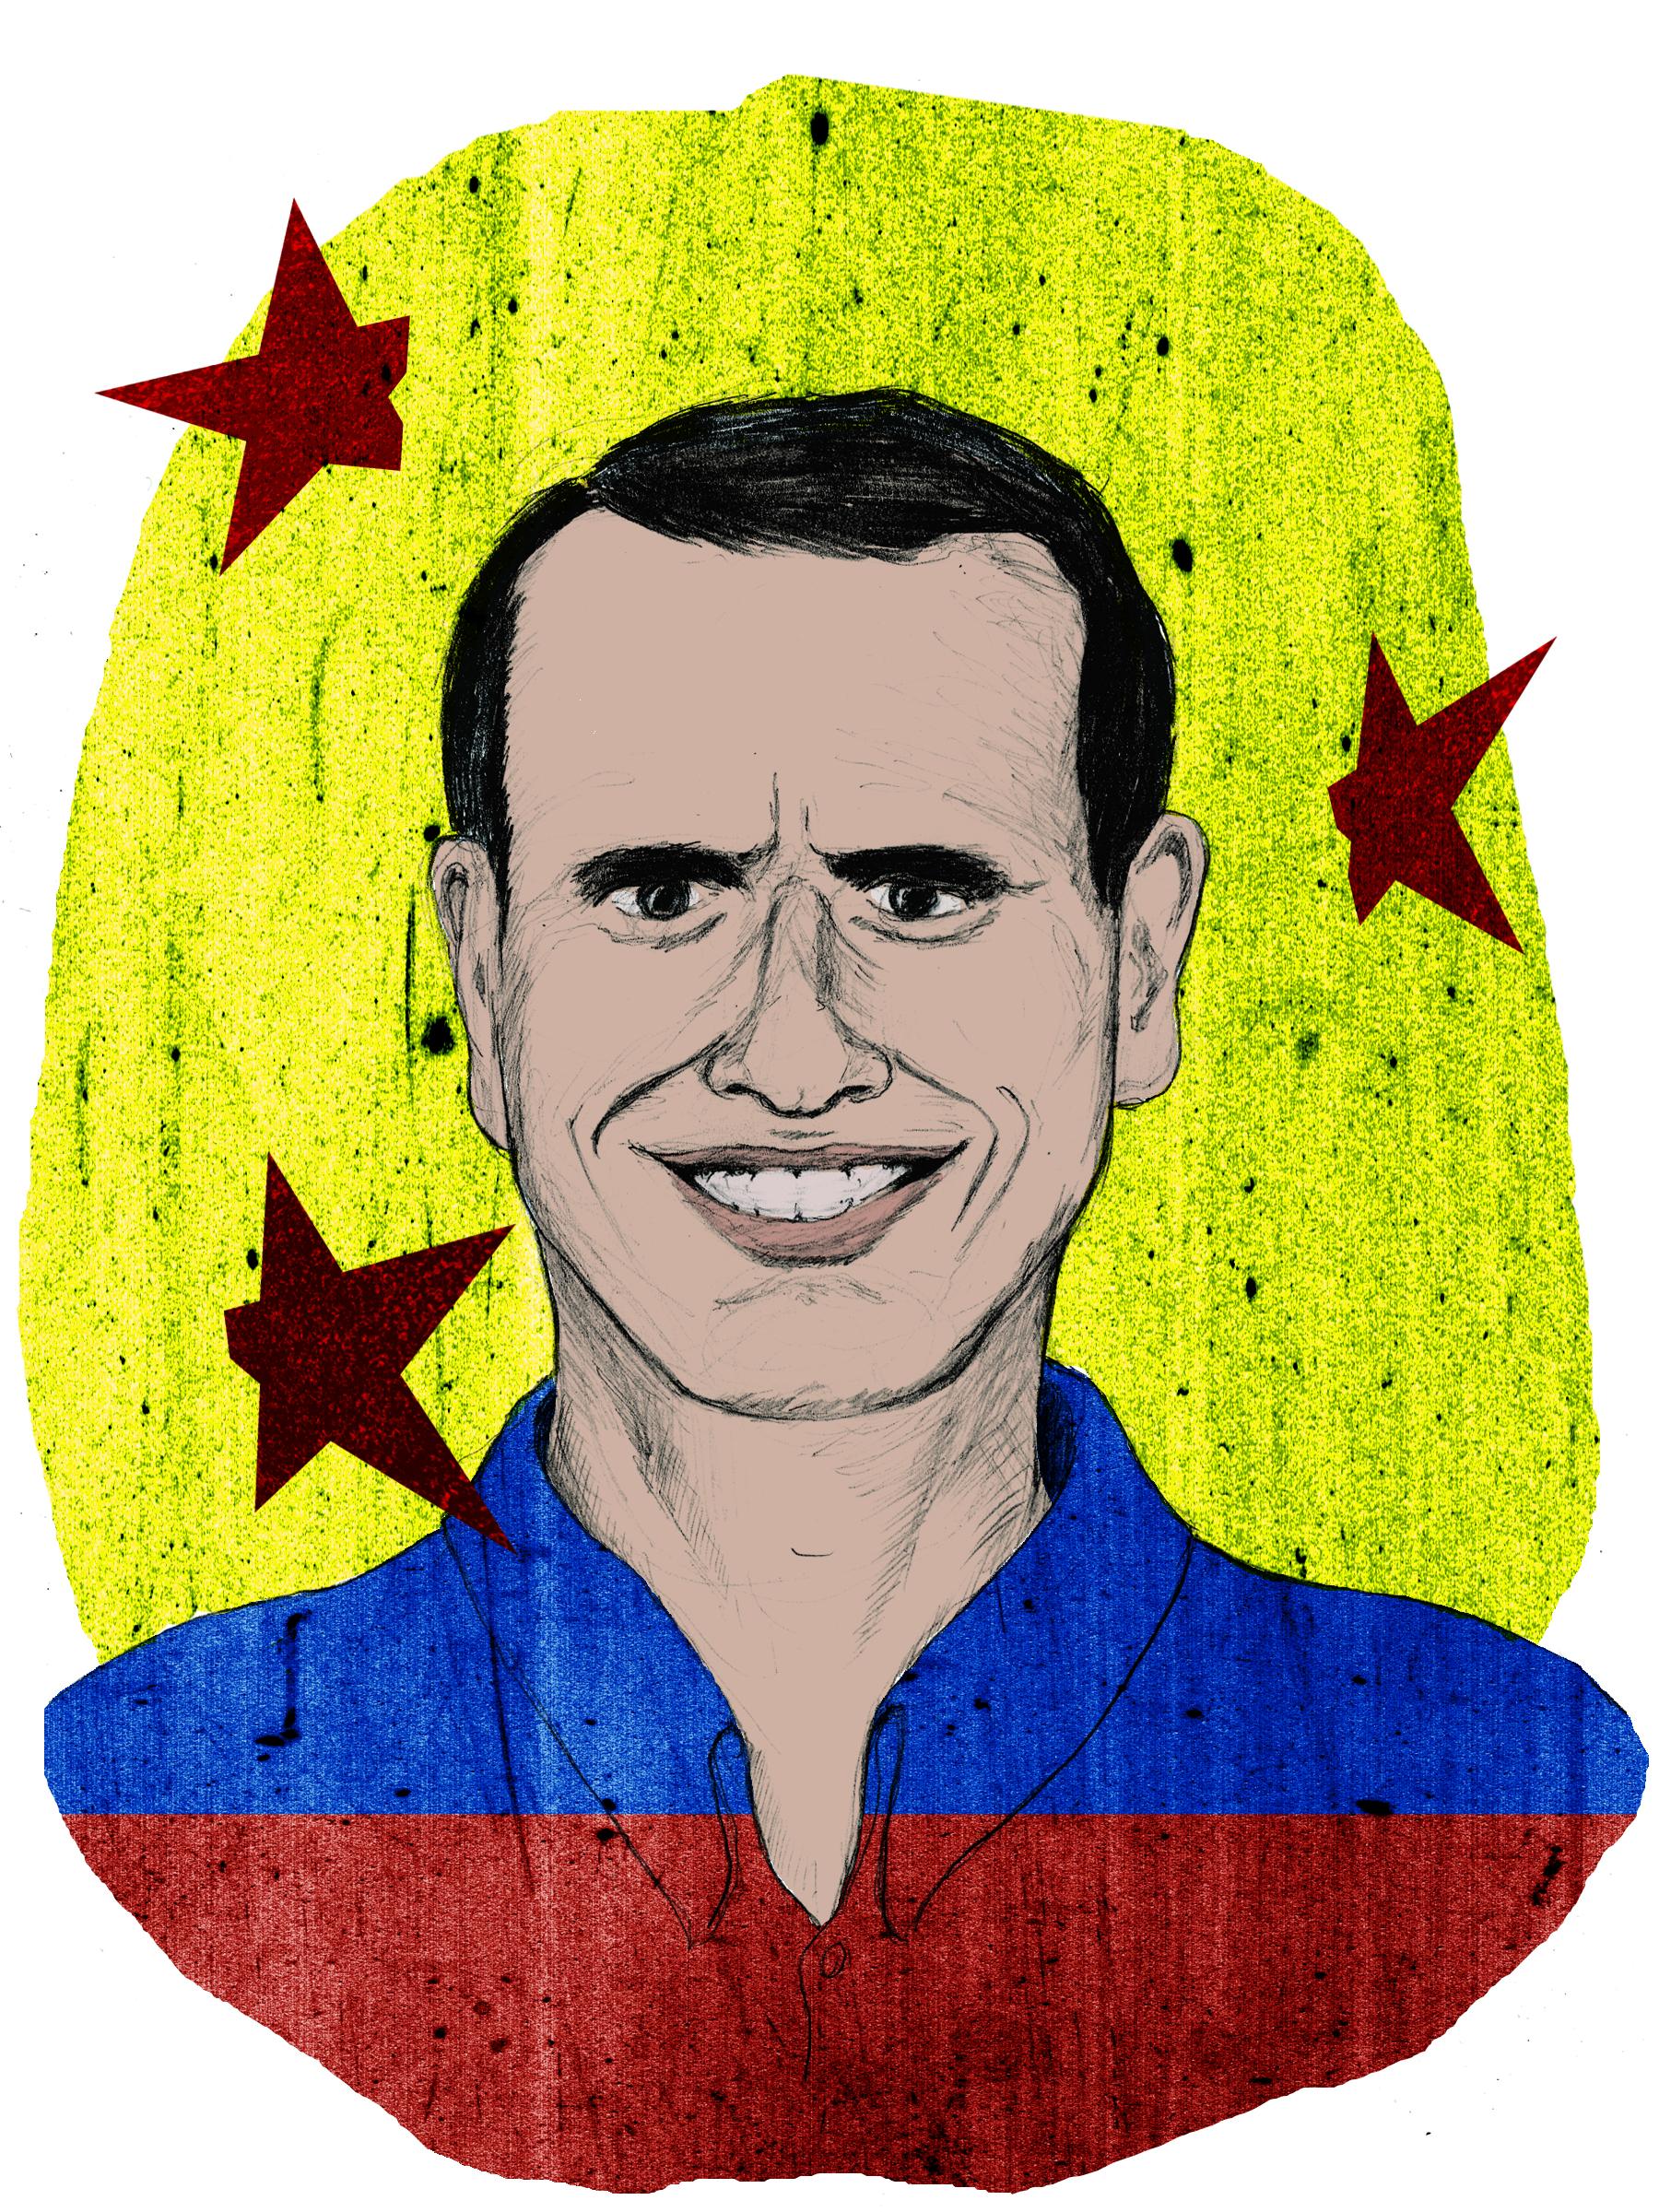 caprilesFINAL.jpg